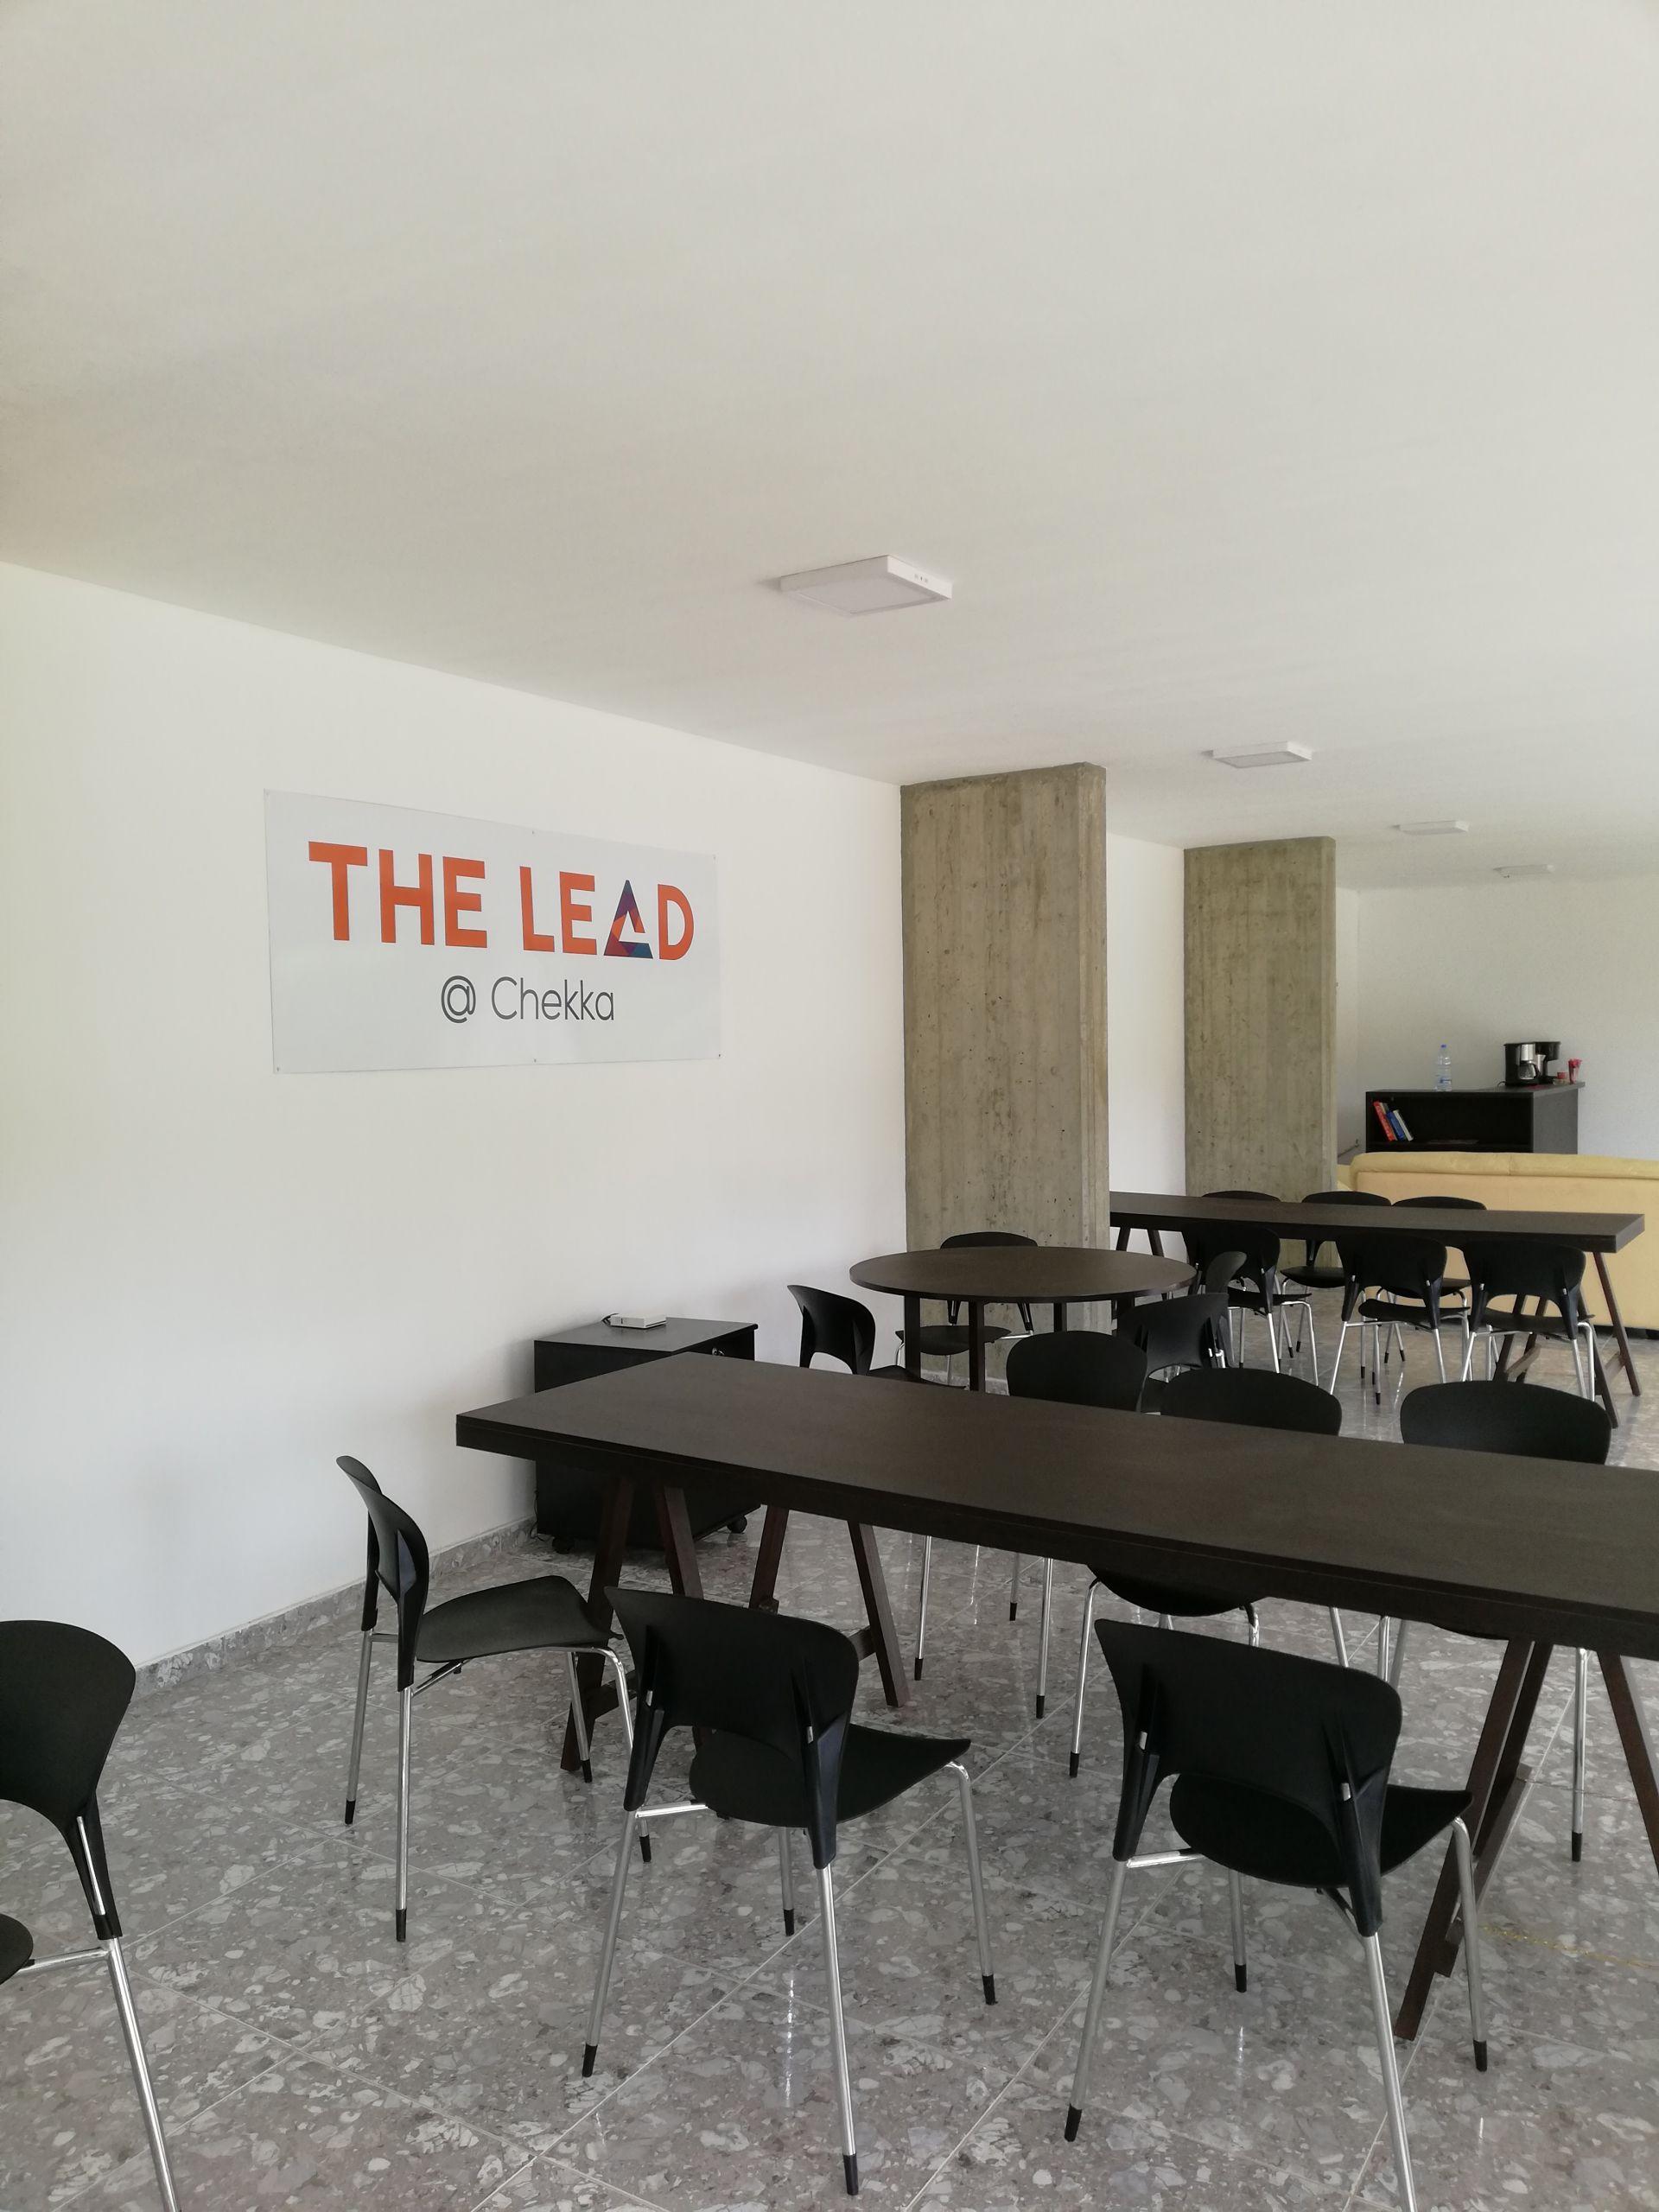 The LEAD, Chekka